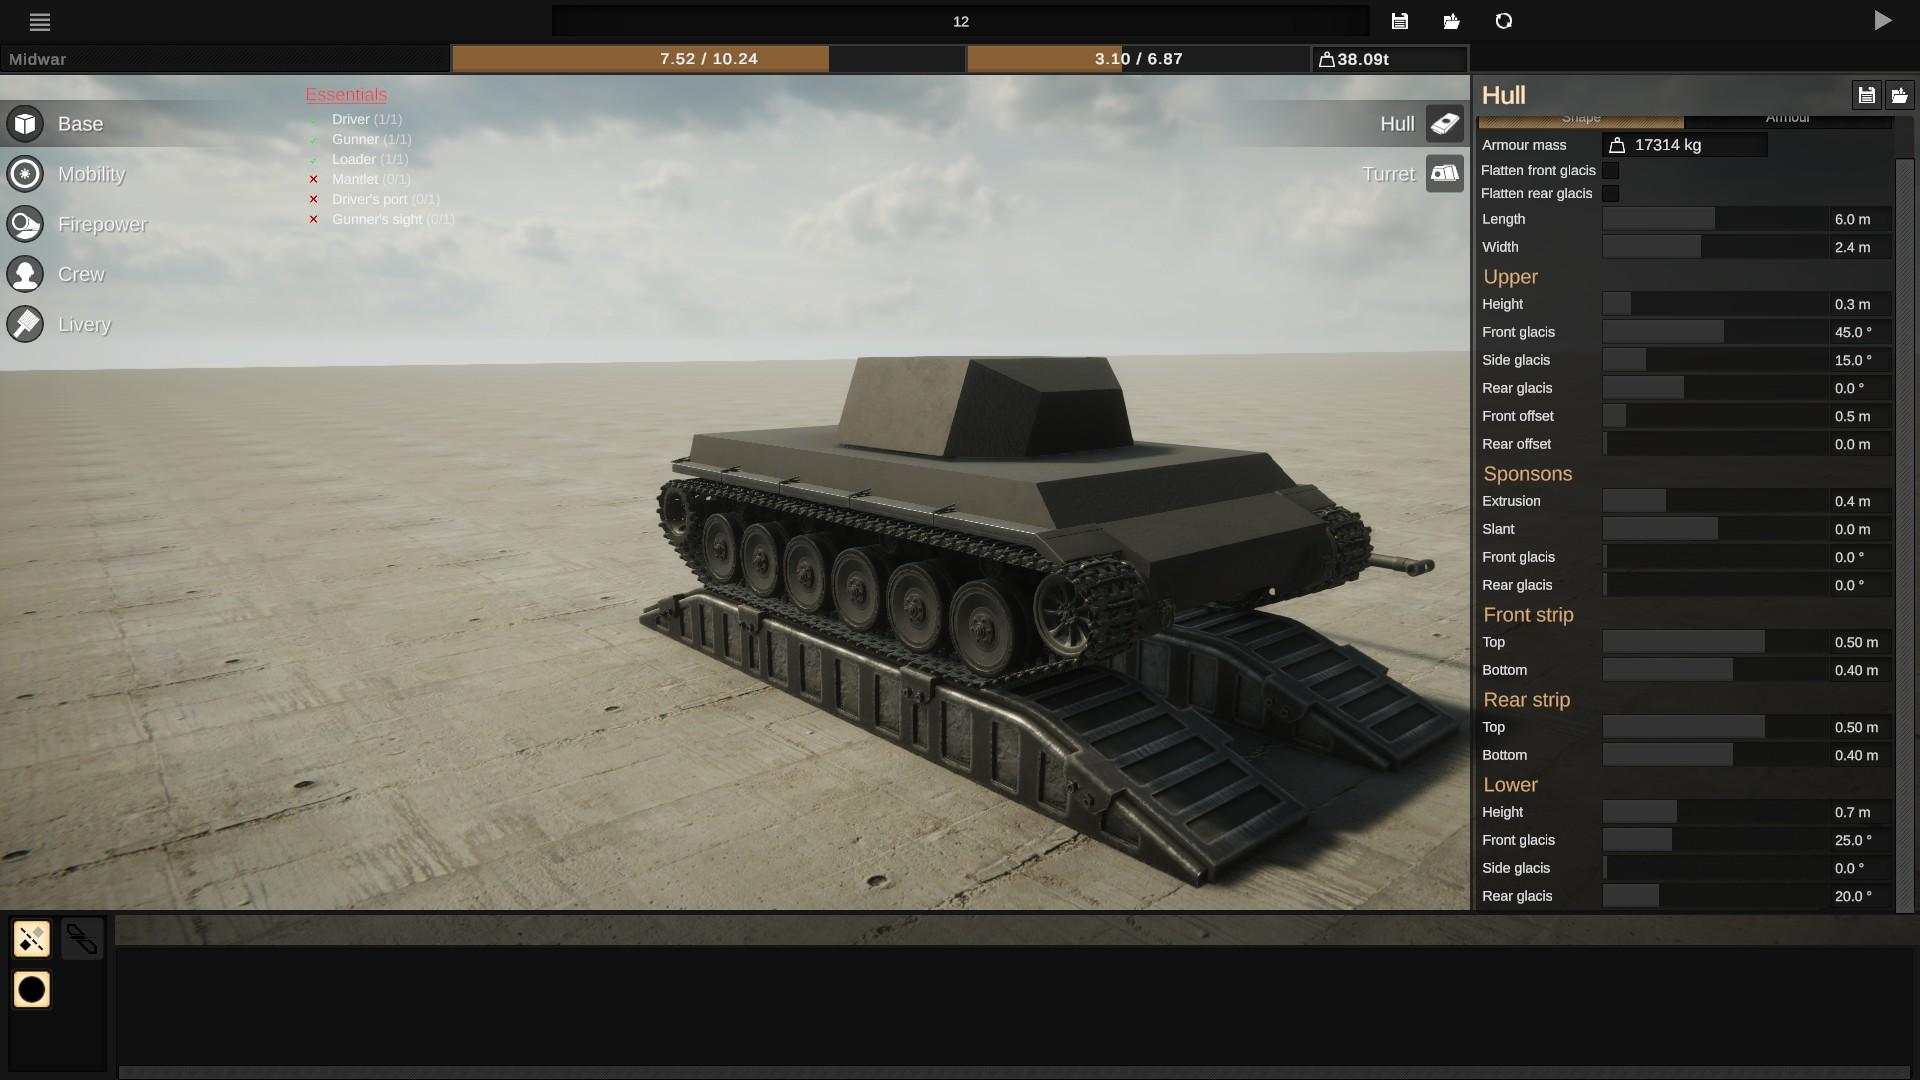 Sprocket - Basic Troubleshooting Steps + Tank Mobility - Base - F78BB8B